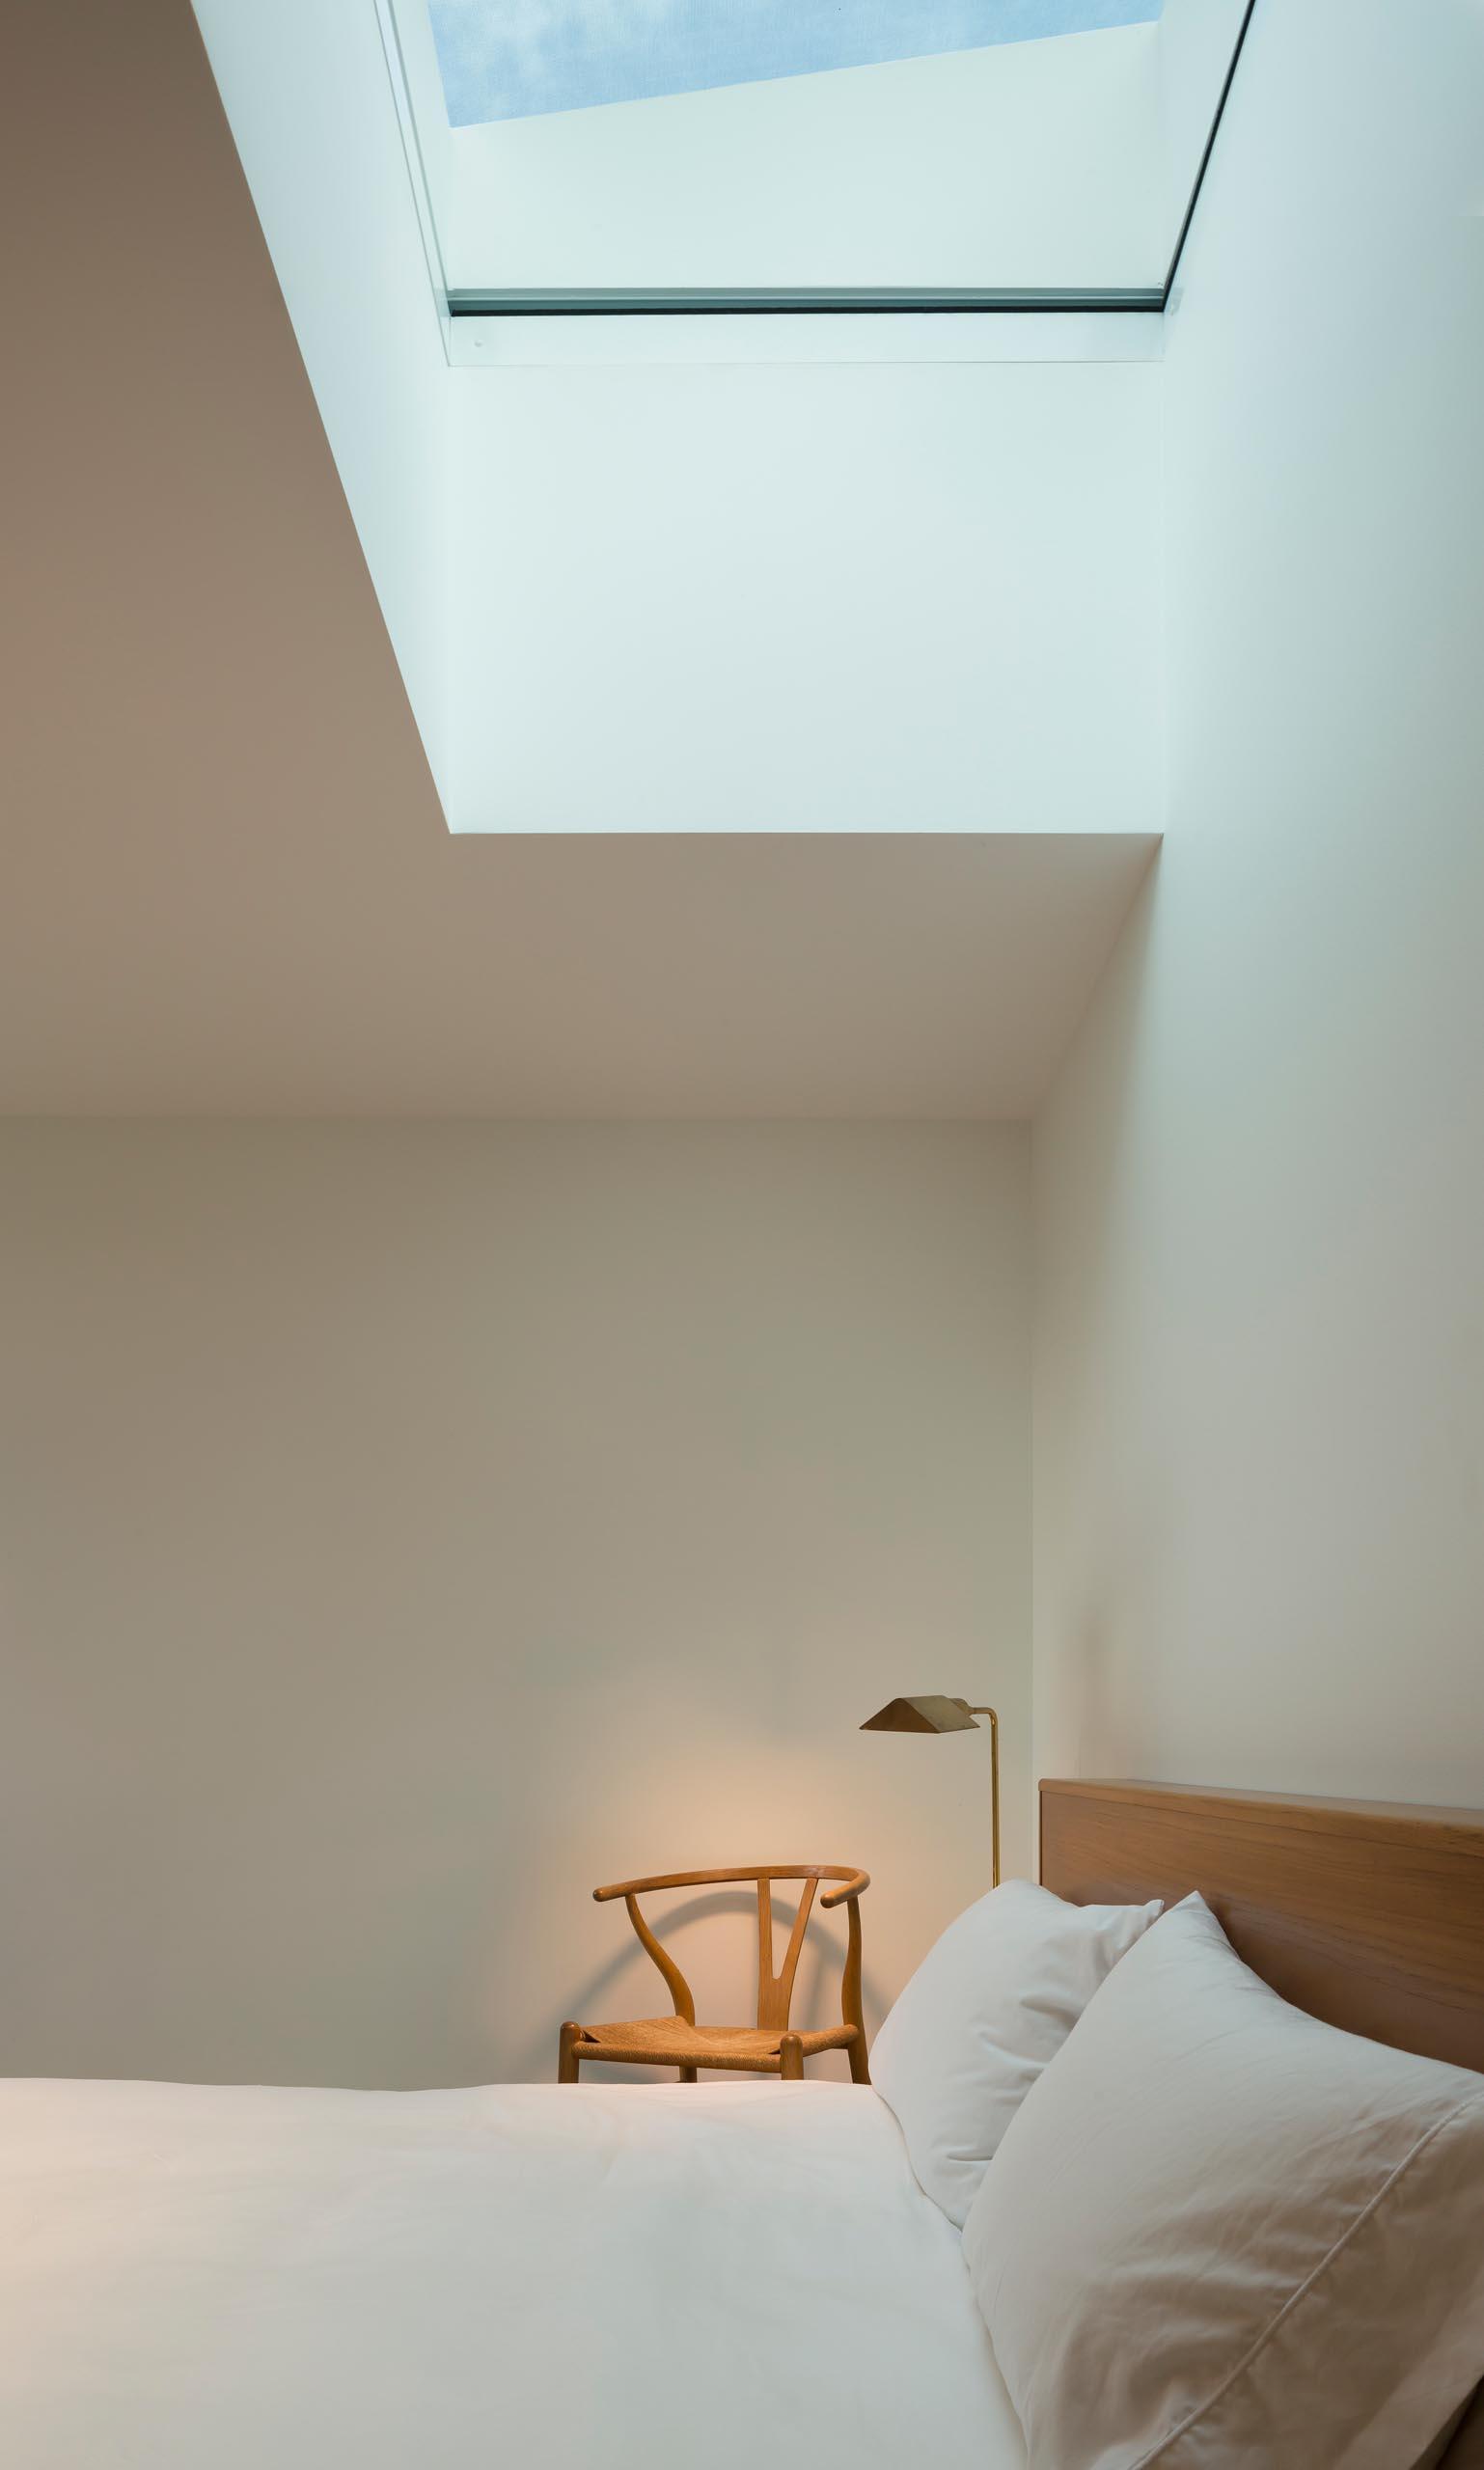 A modern bedroom with a skylight.